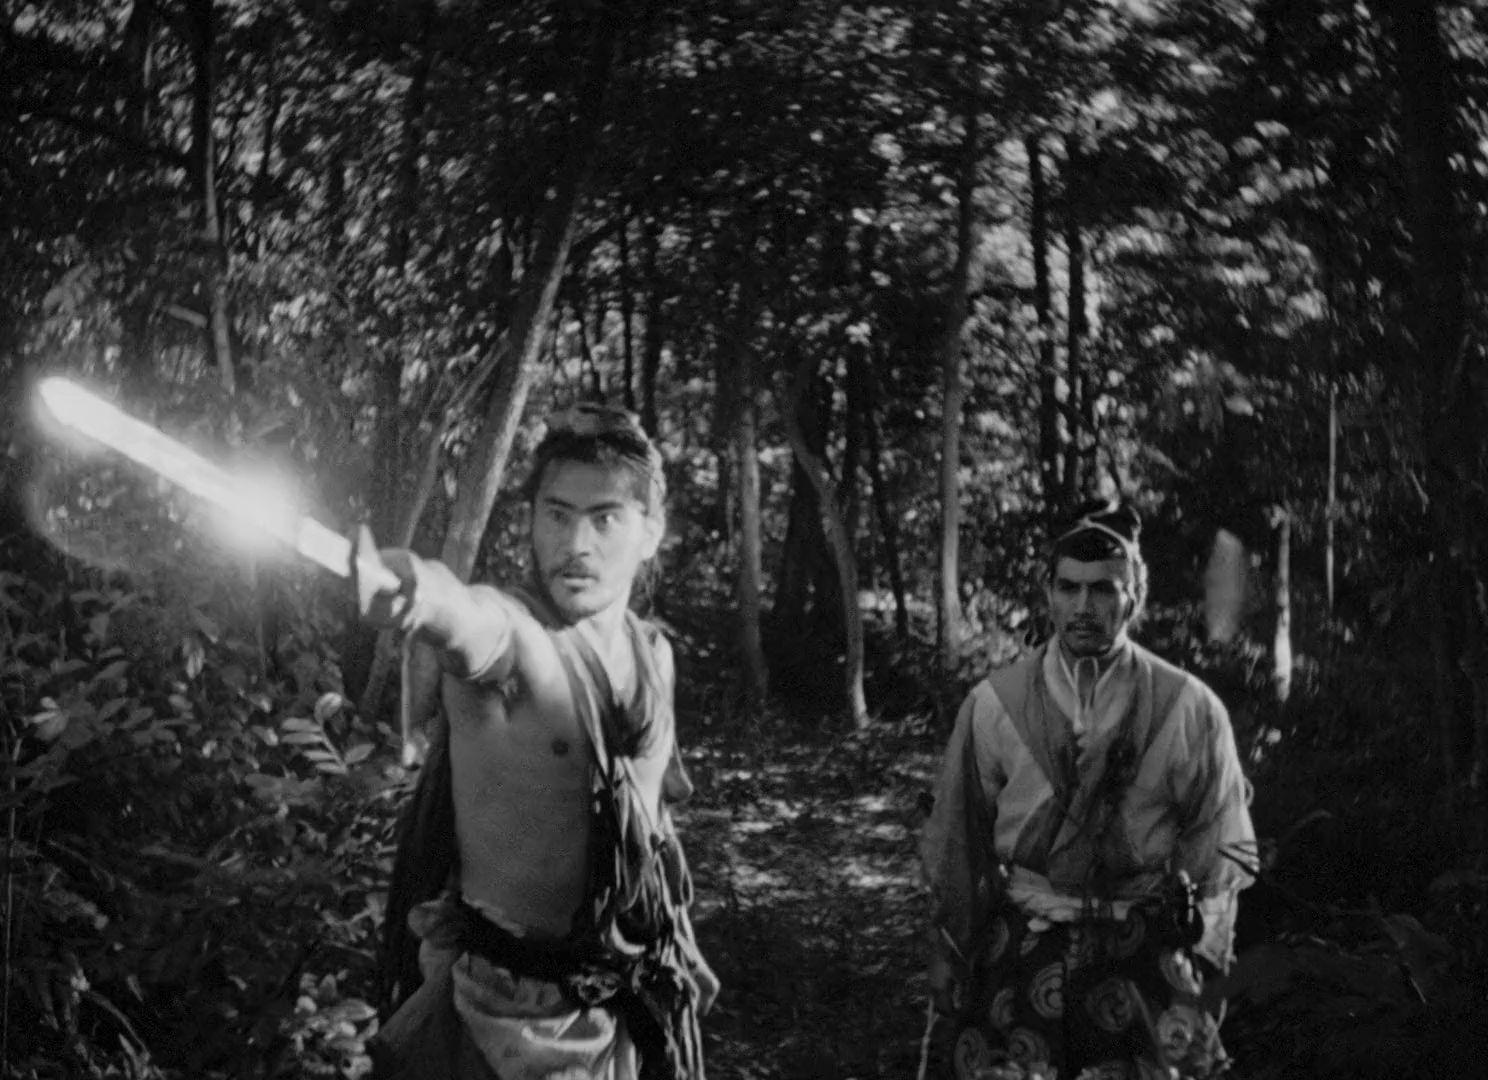 Akira Kurosawa's Rashômon on Criterion